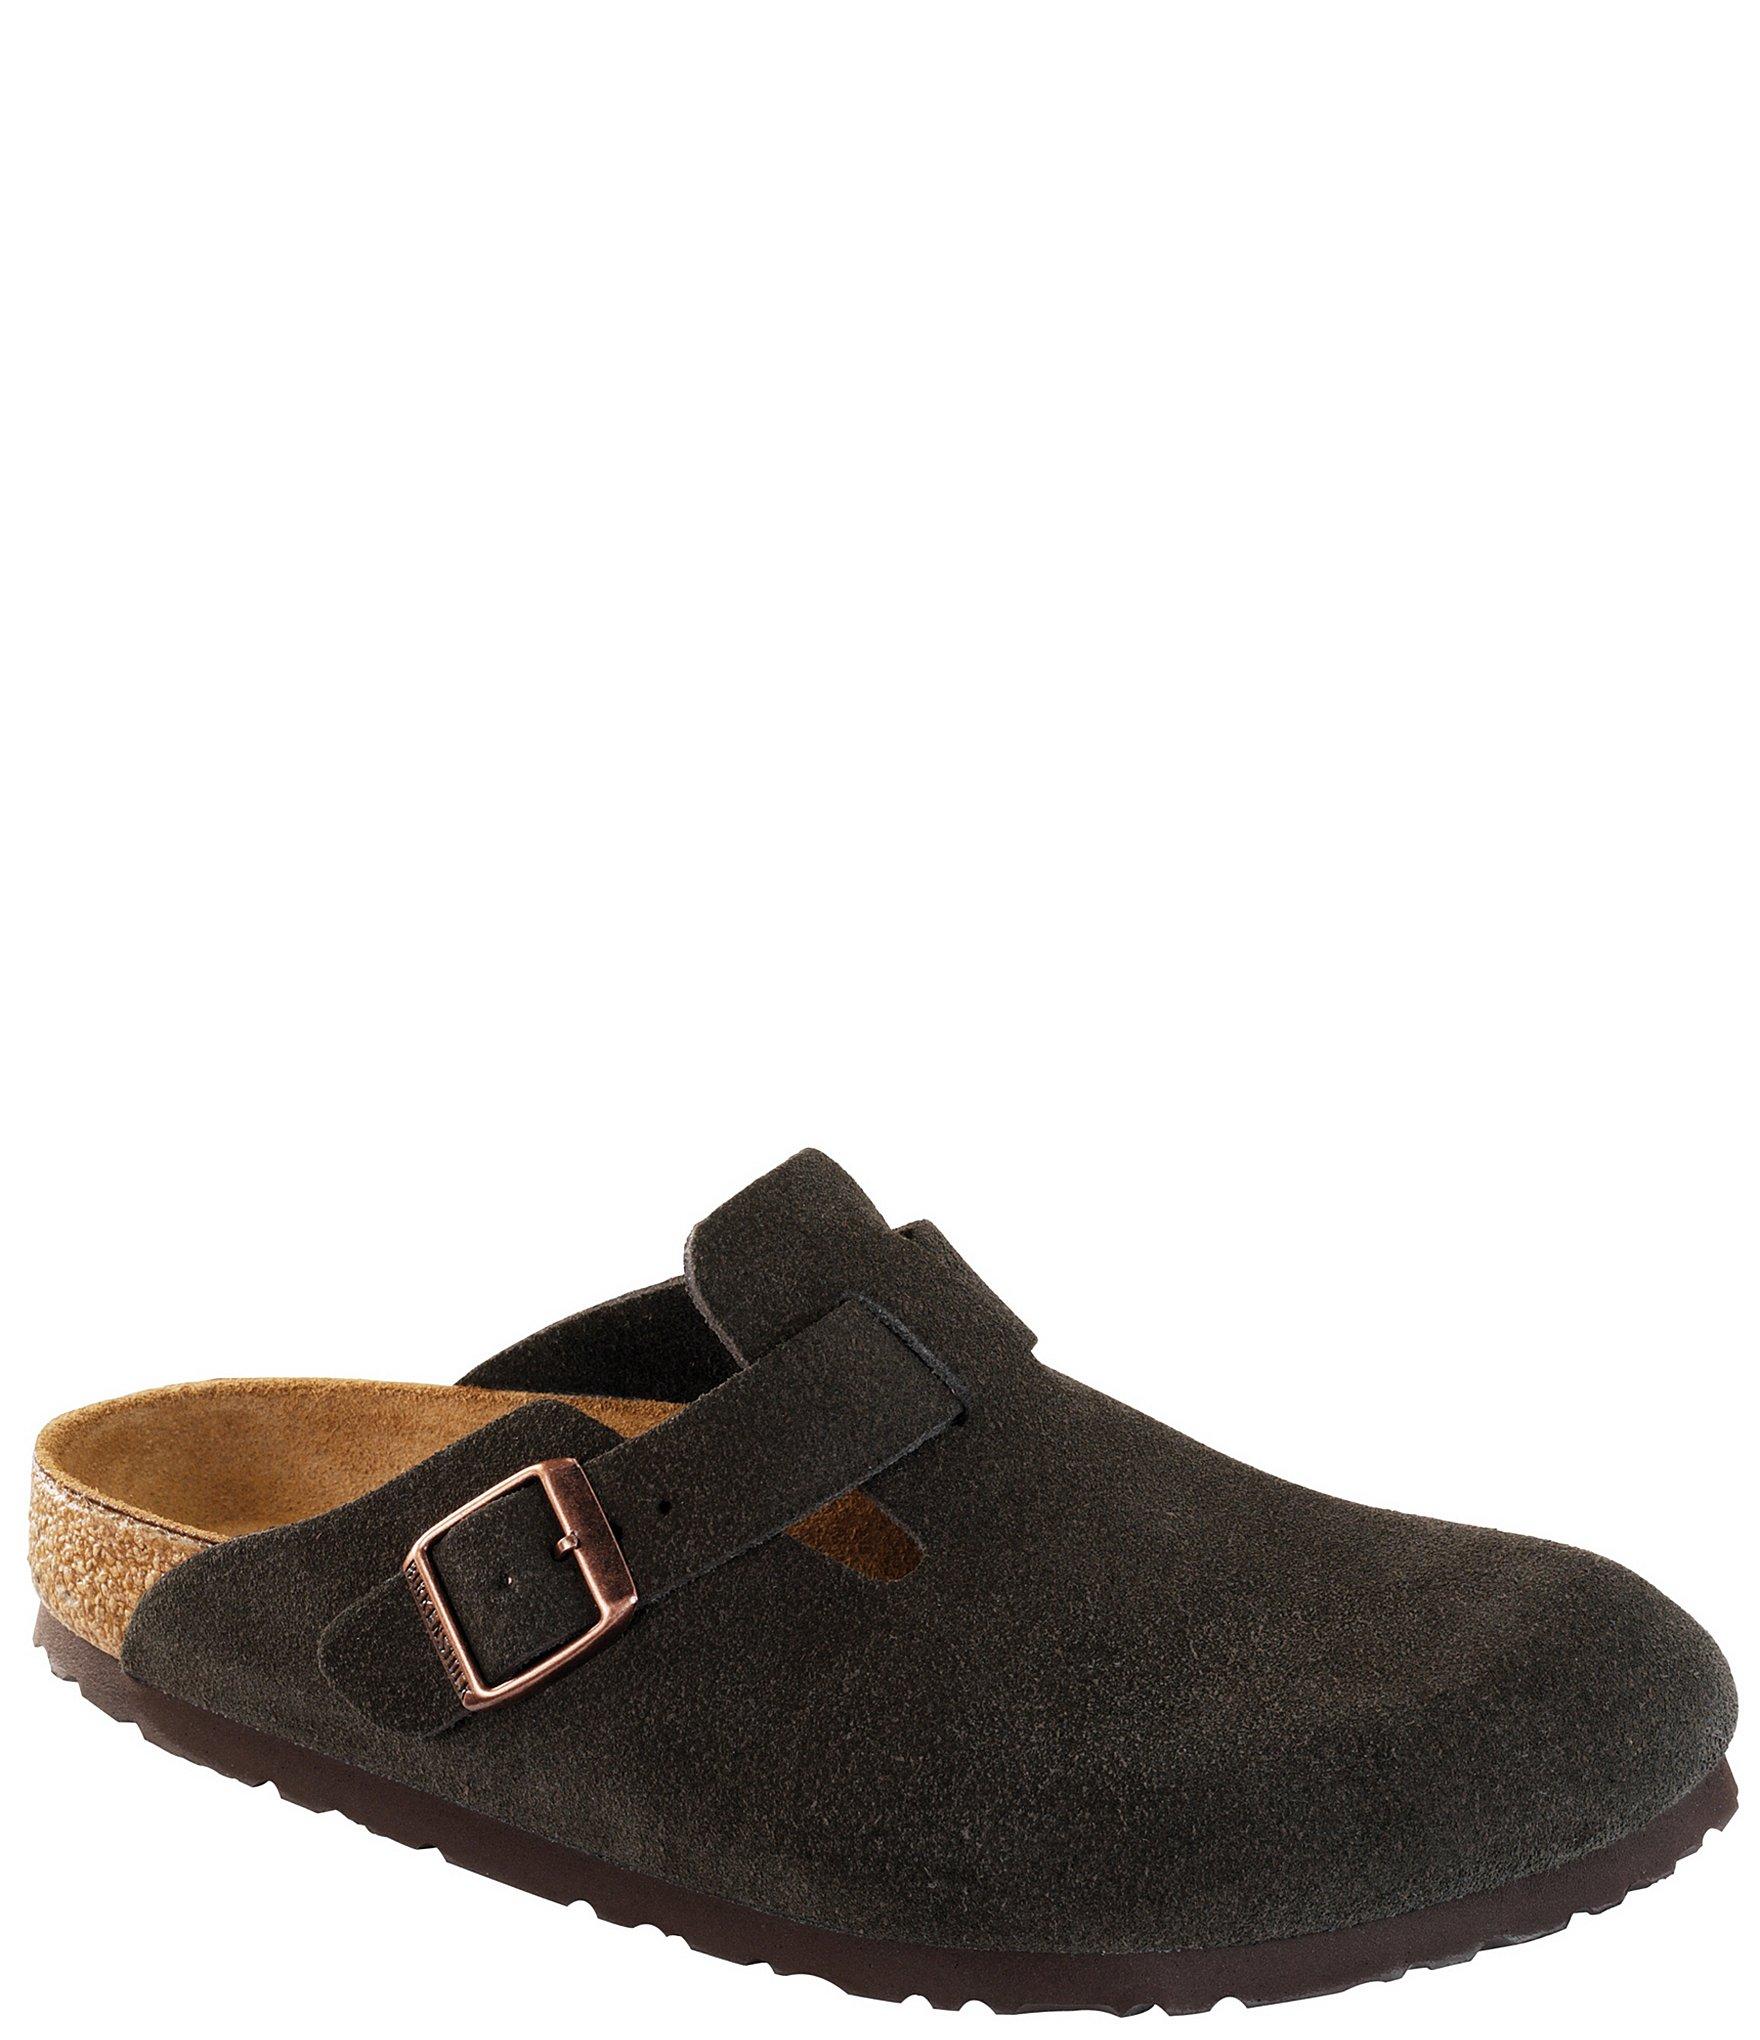 0258071ffdce Birkenstock Men's Shoes | Dillard's